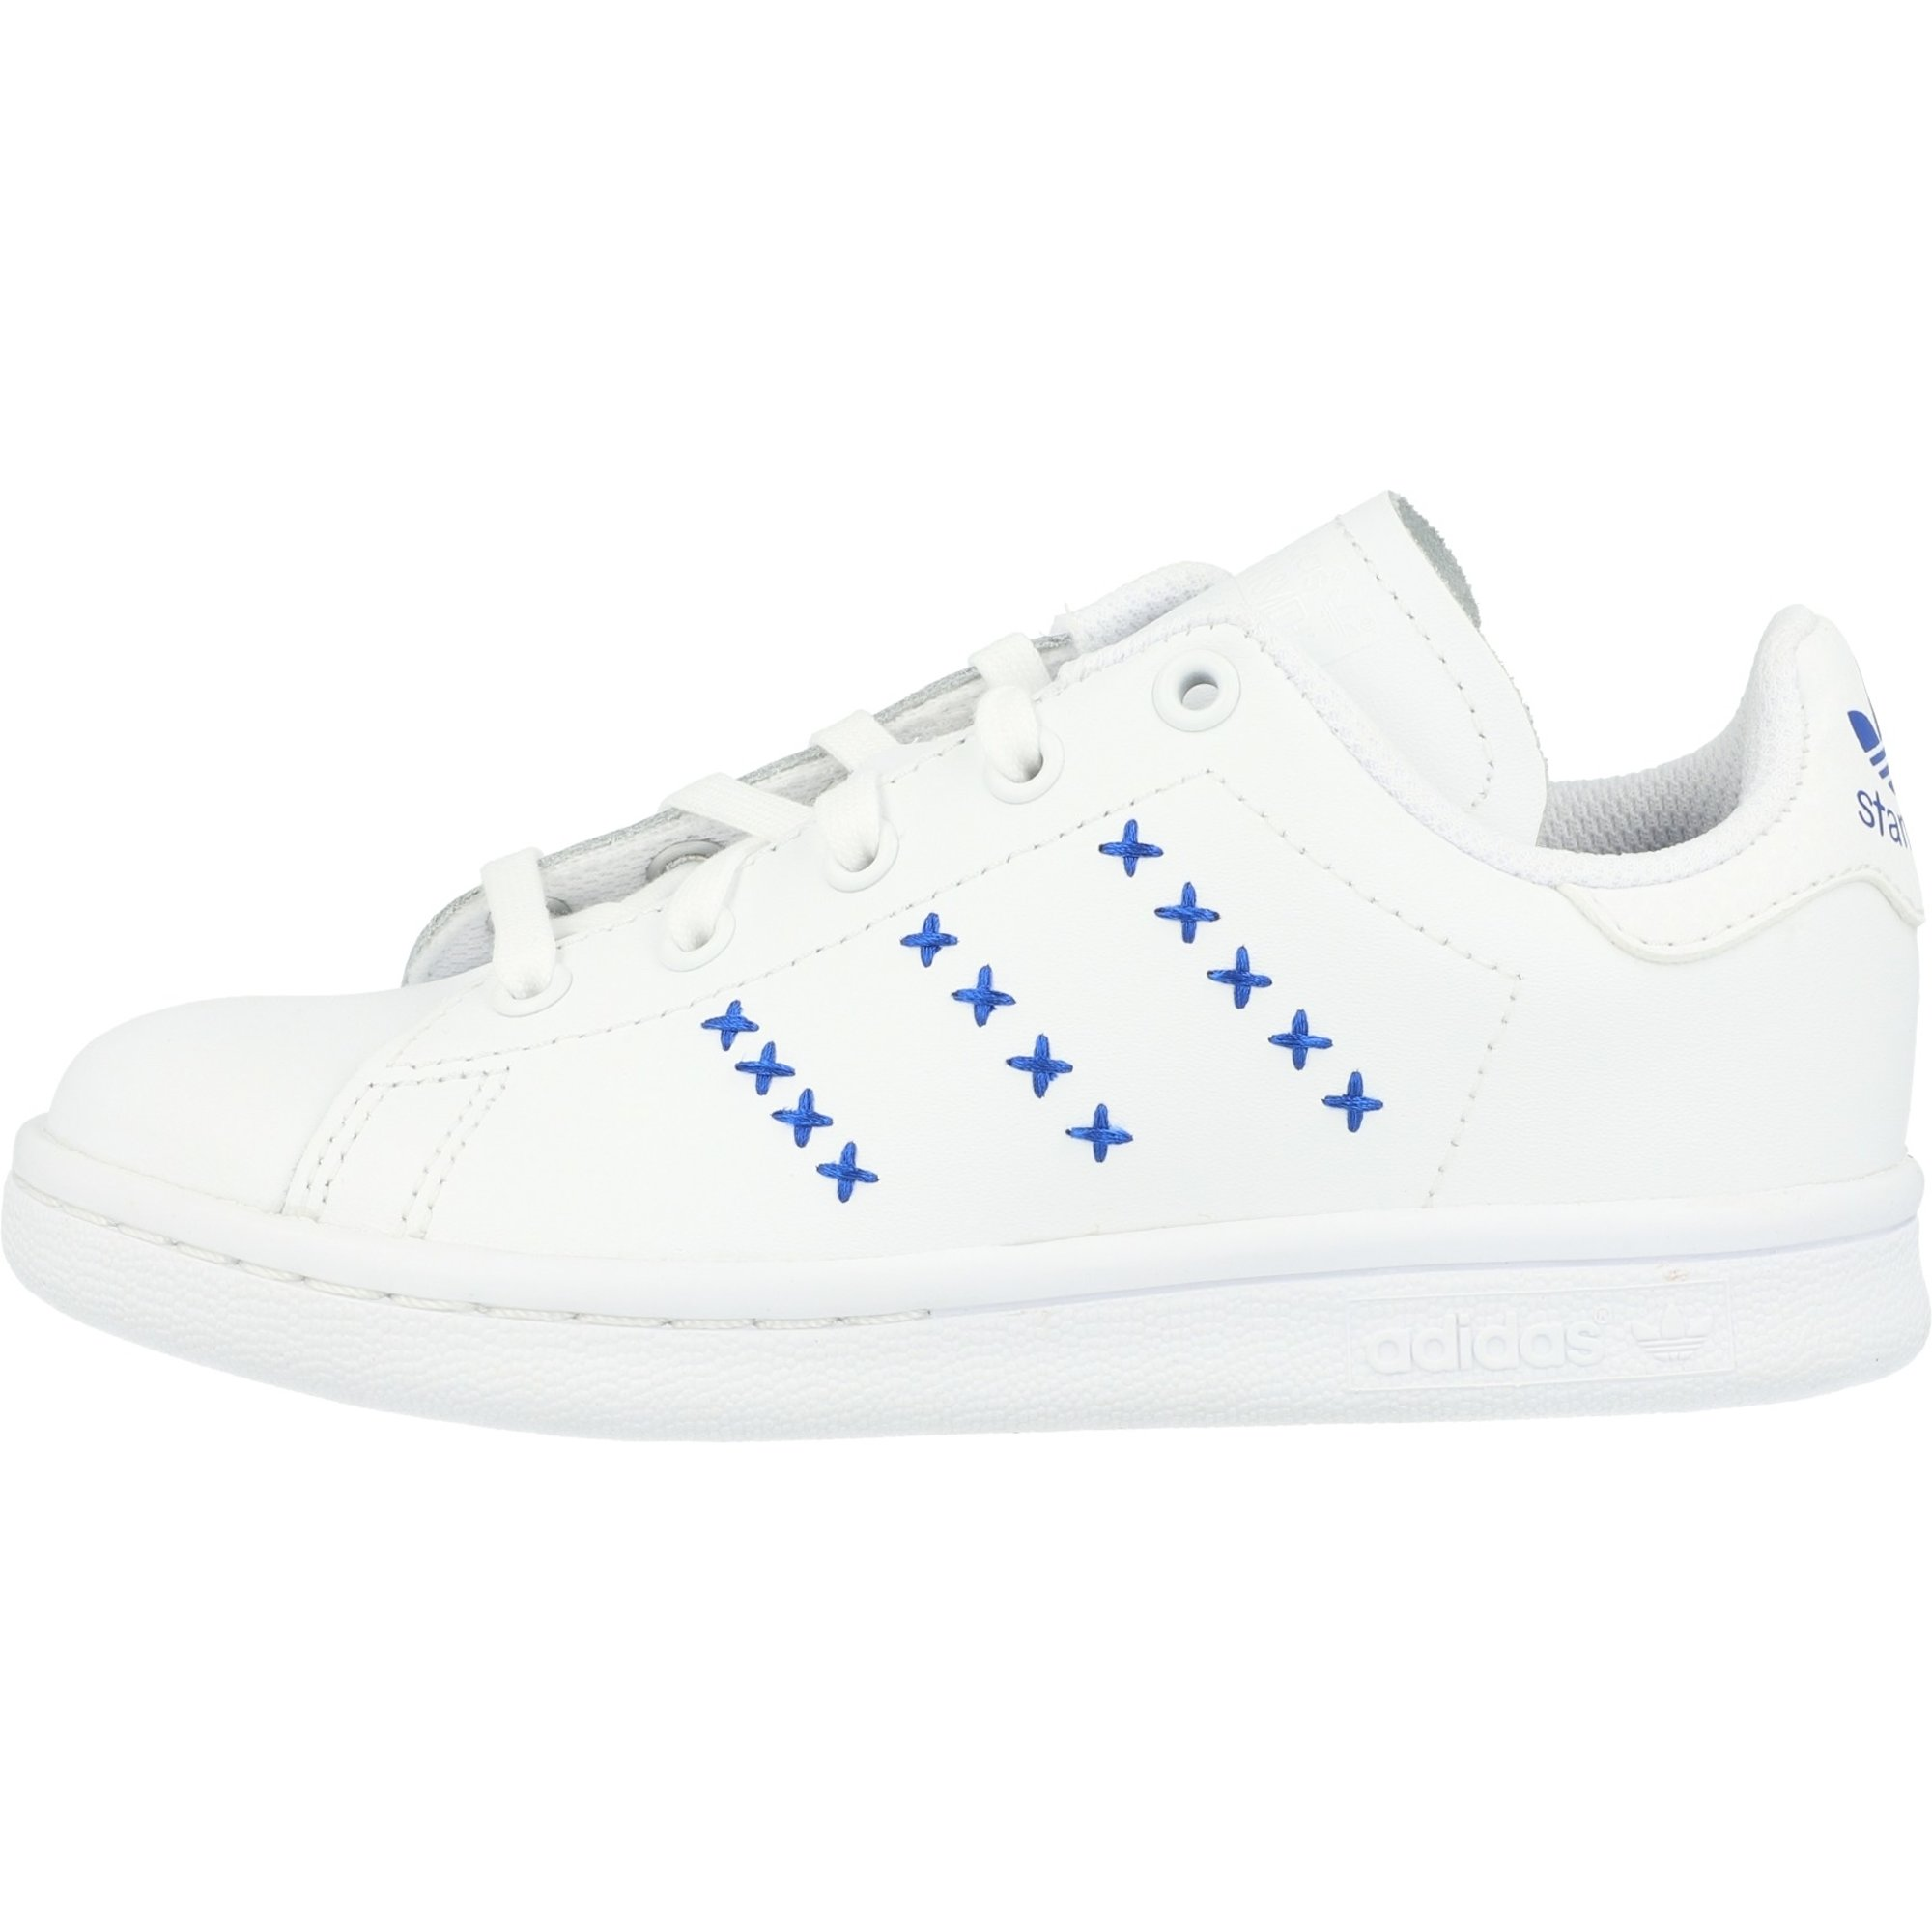 adidas Originals Stan Smith C White/Royal Blue Leather Child